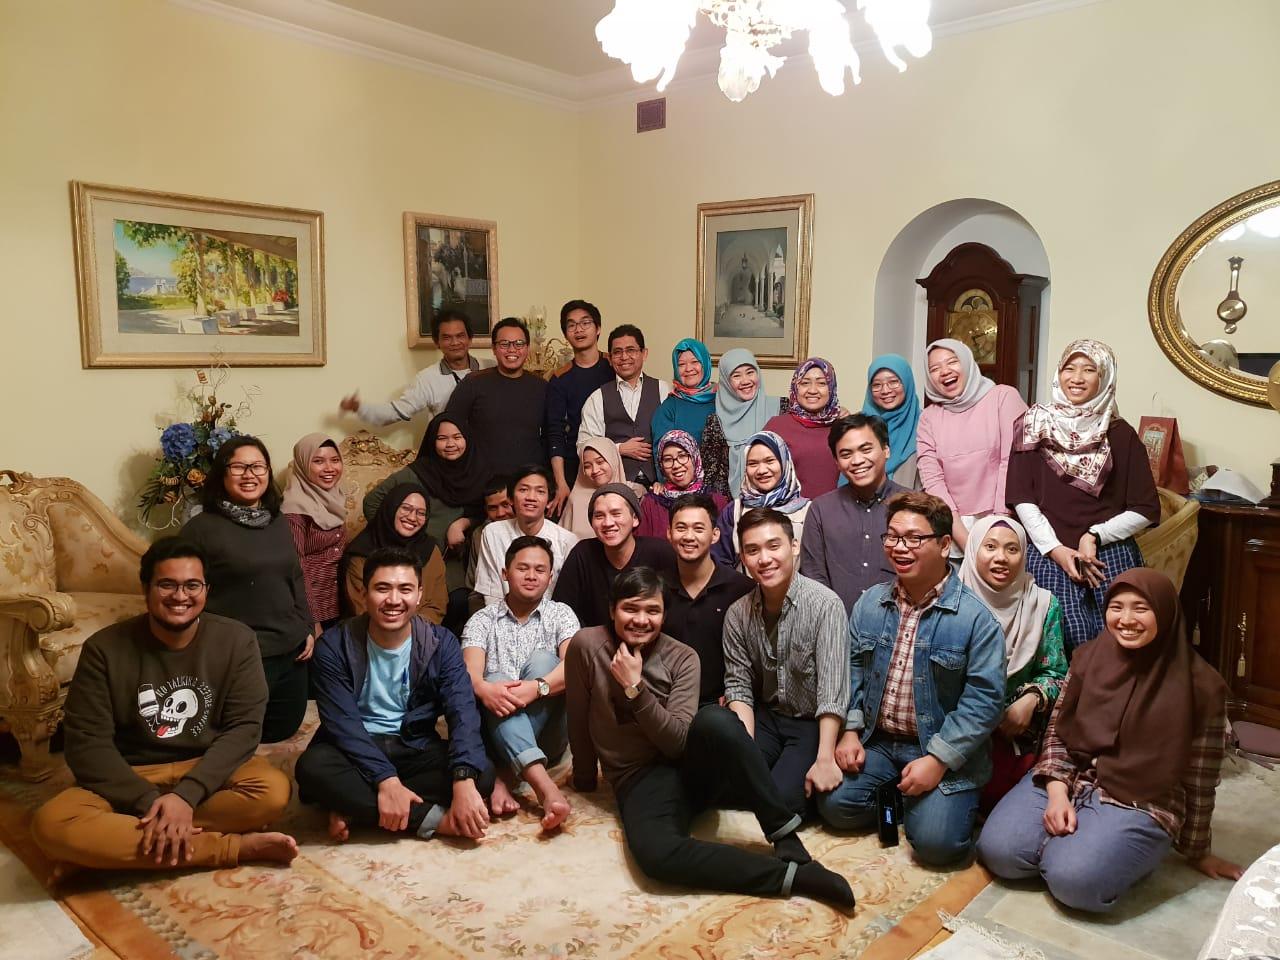 https: img-o.okeinfo.net content 2019 01 24 65 2008892 mahasiswa-indonesia-di-rusia-belajar-menulis-bareng-asma-nadia-vcei3dZSeE.jpg